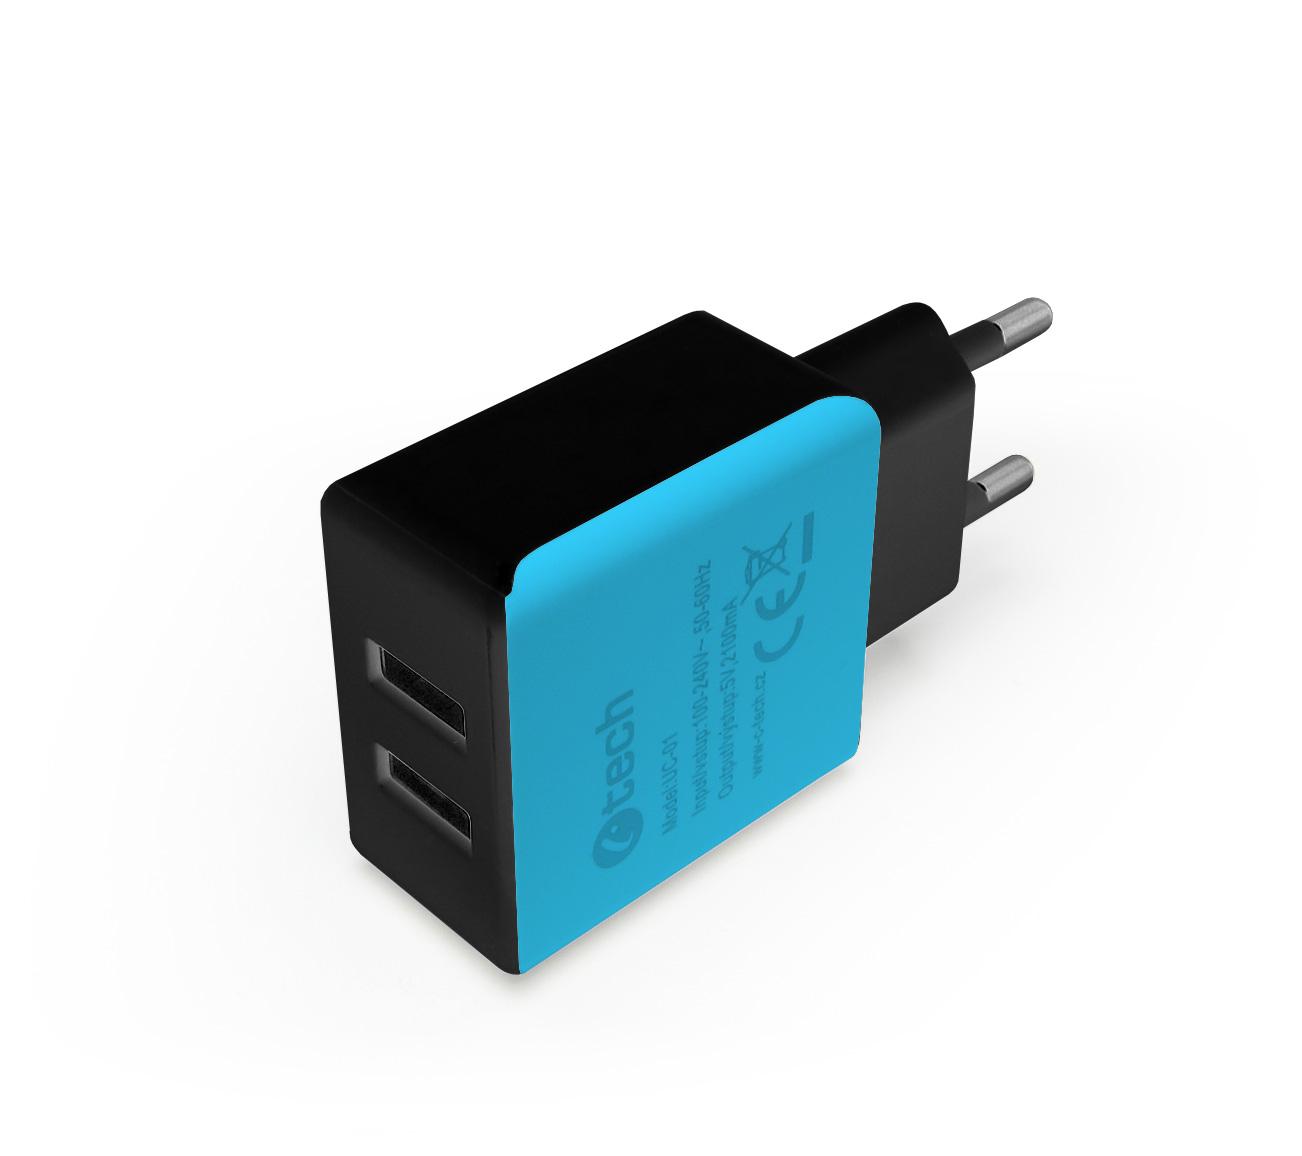 C-TECH Nabíječka USB UC-01, 2x USB, 2,1A, černo-modrá